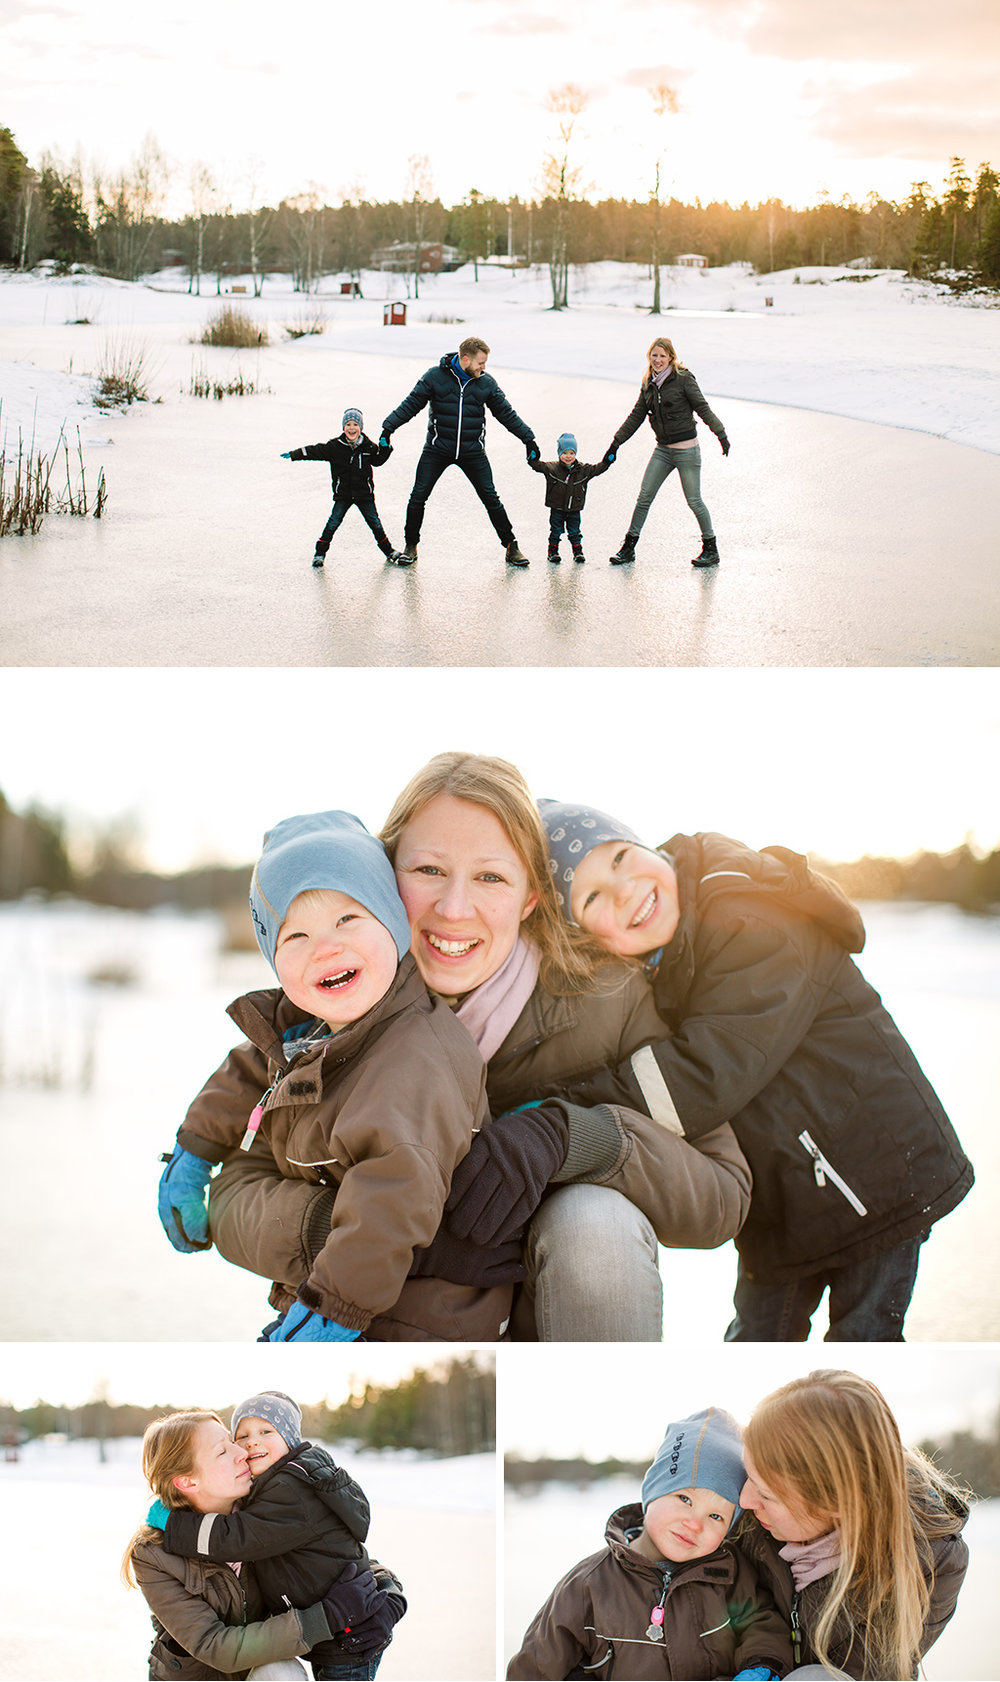 Vinter-familjefotografering-familjefotograf-Stockholm_2.jpg